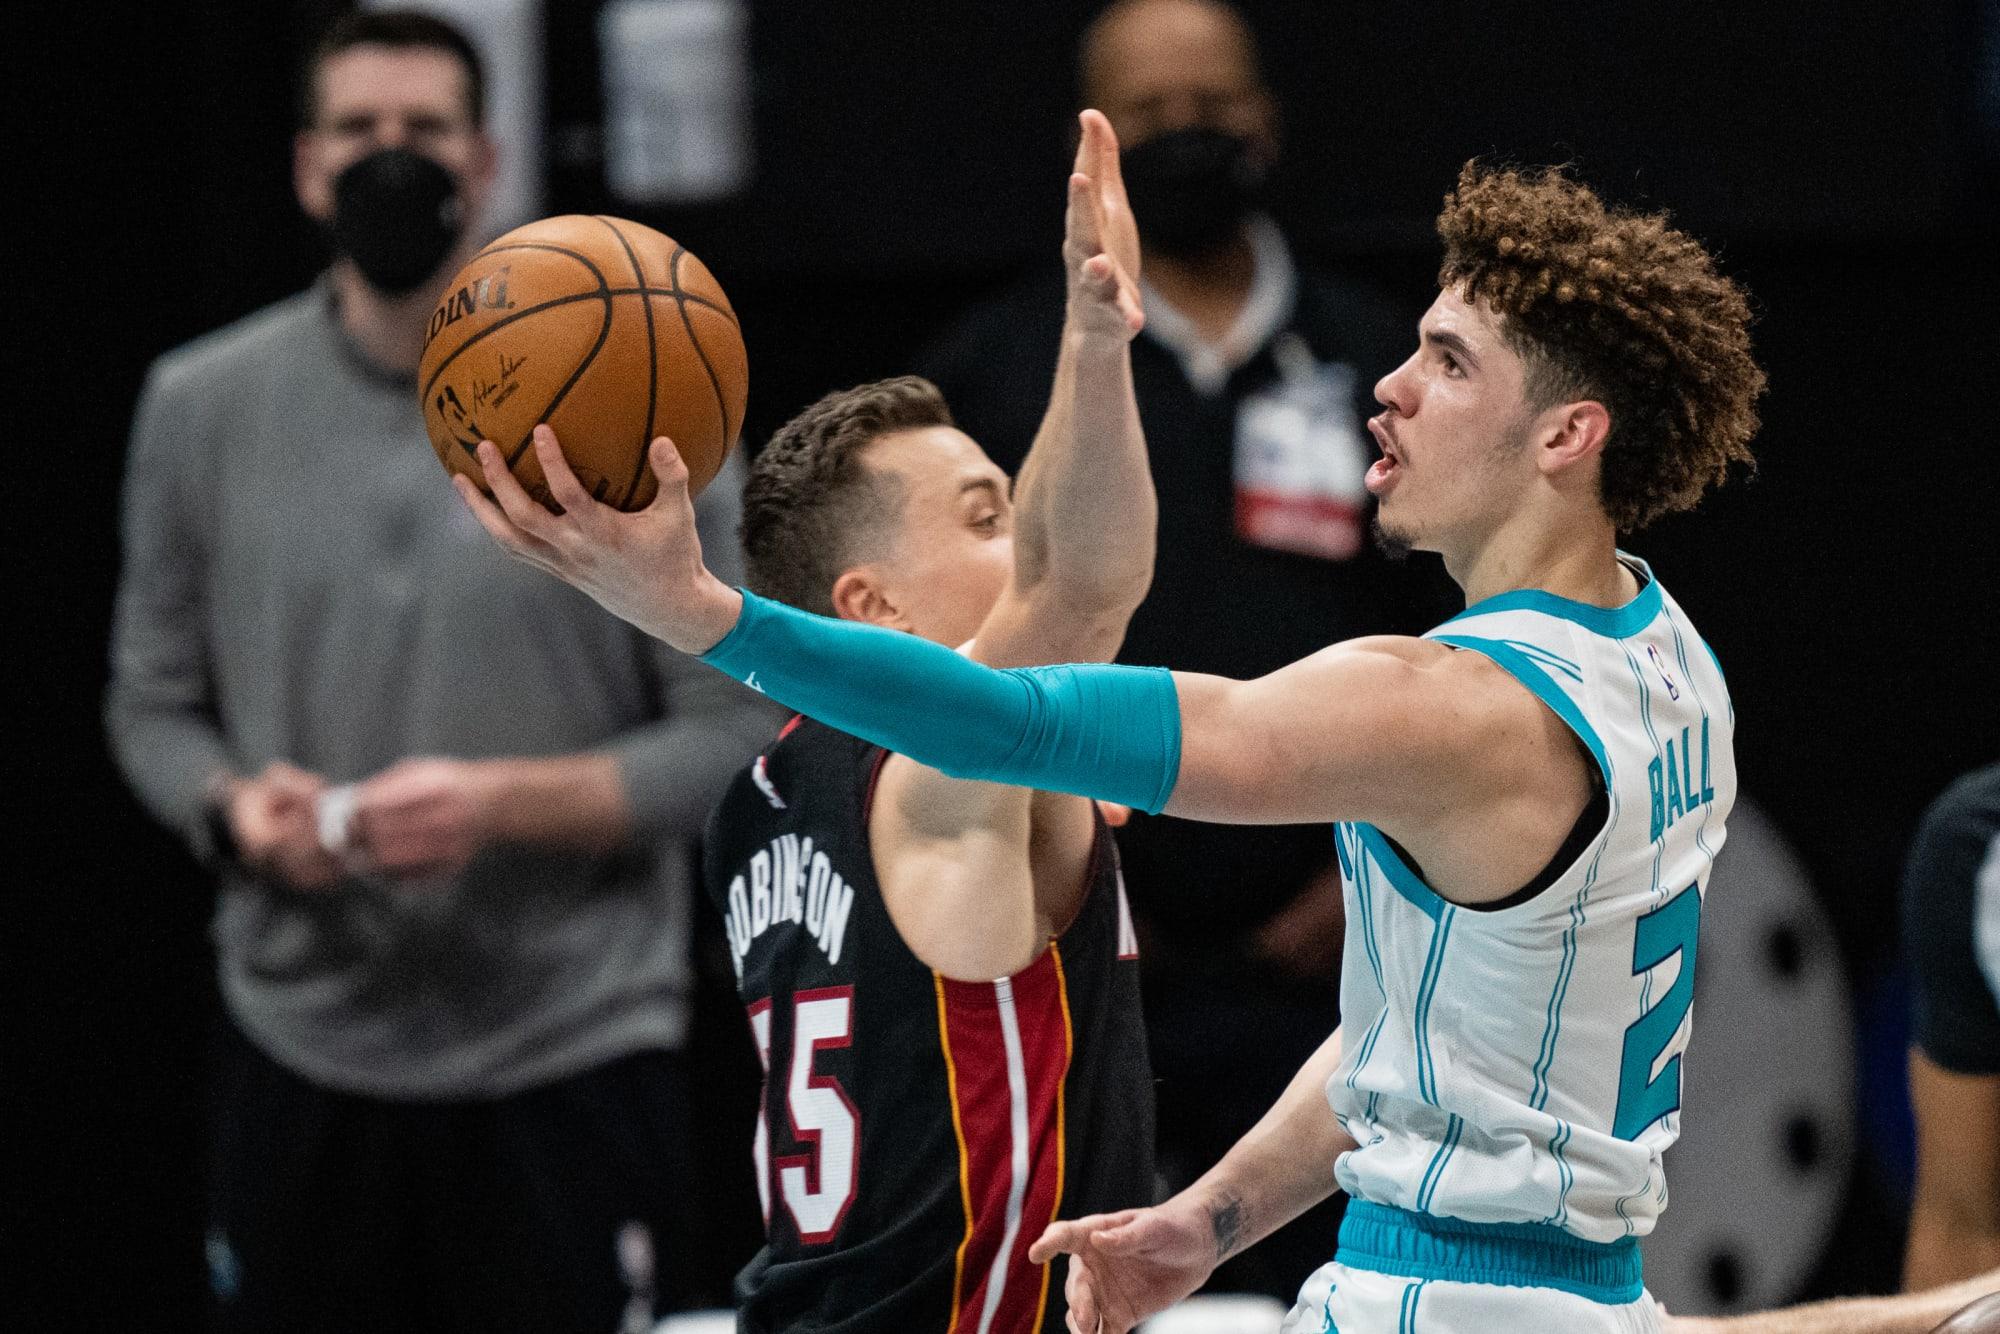 Charlotte Hornets: The next steps in LaMelo Ball's development